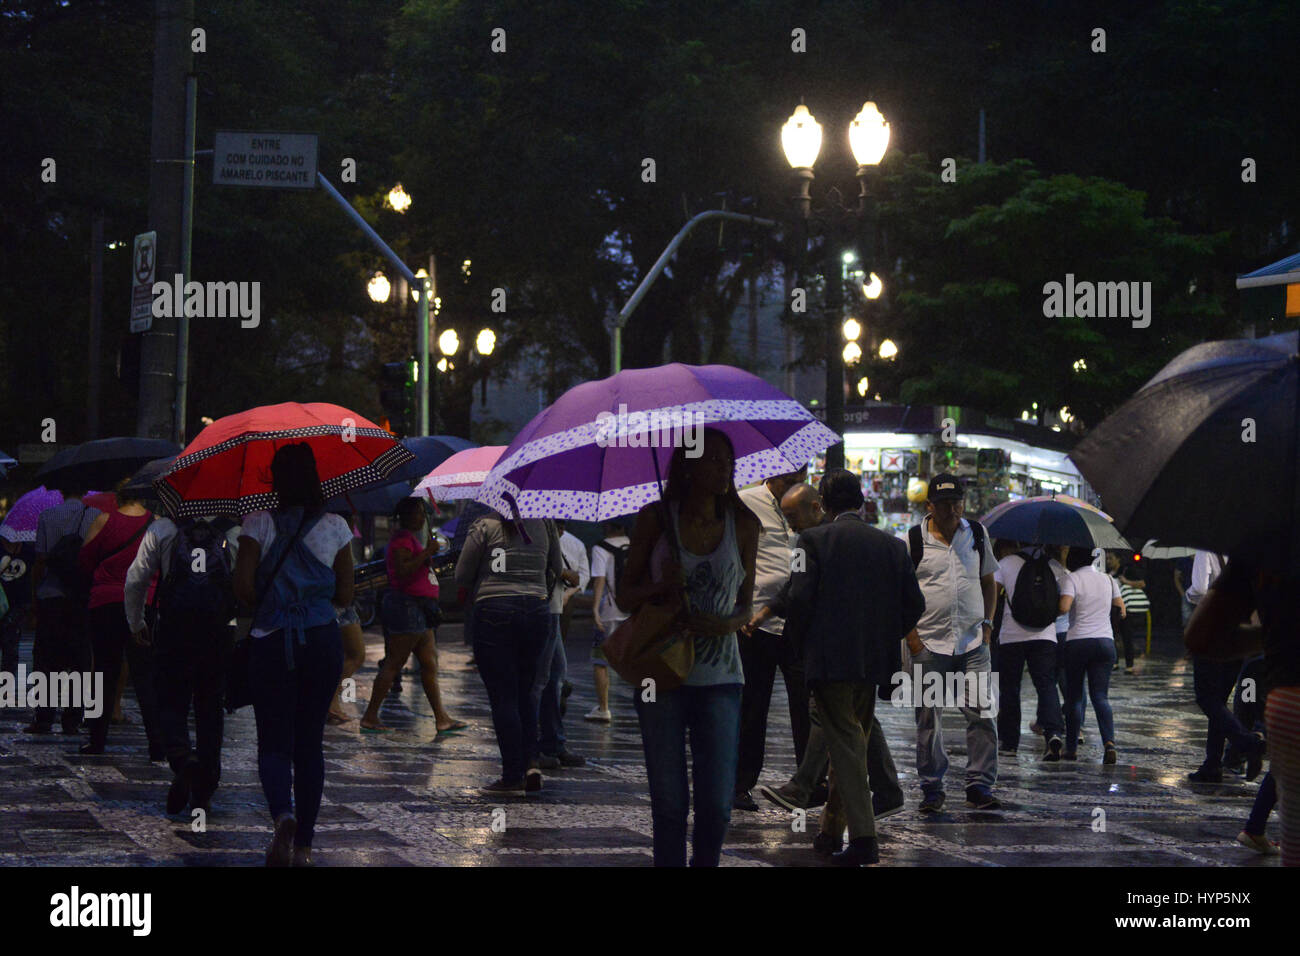 April 6, 2017 - SâO Paulo, São paulo, Brazil - BRAZIL, SP - APRIL 06: People walk through a cold and wet night Stock Photo